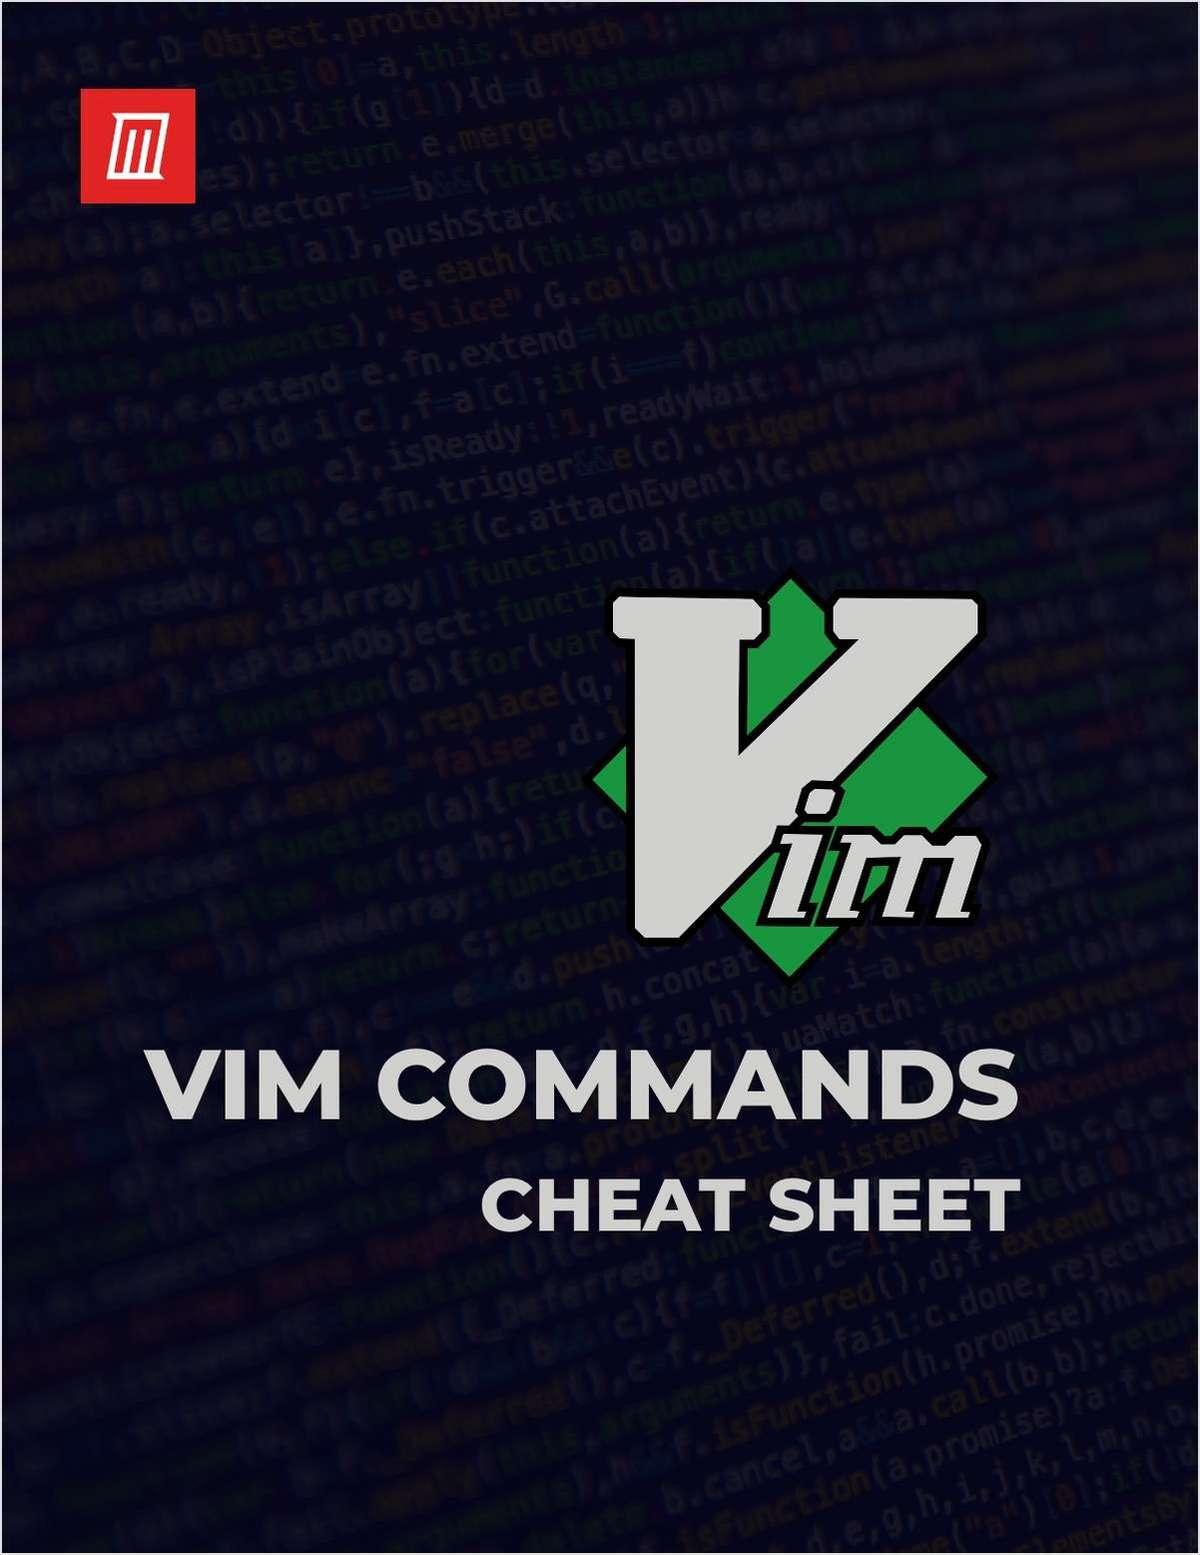 Essential Vim Commands Cheat Sheet